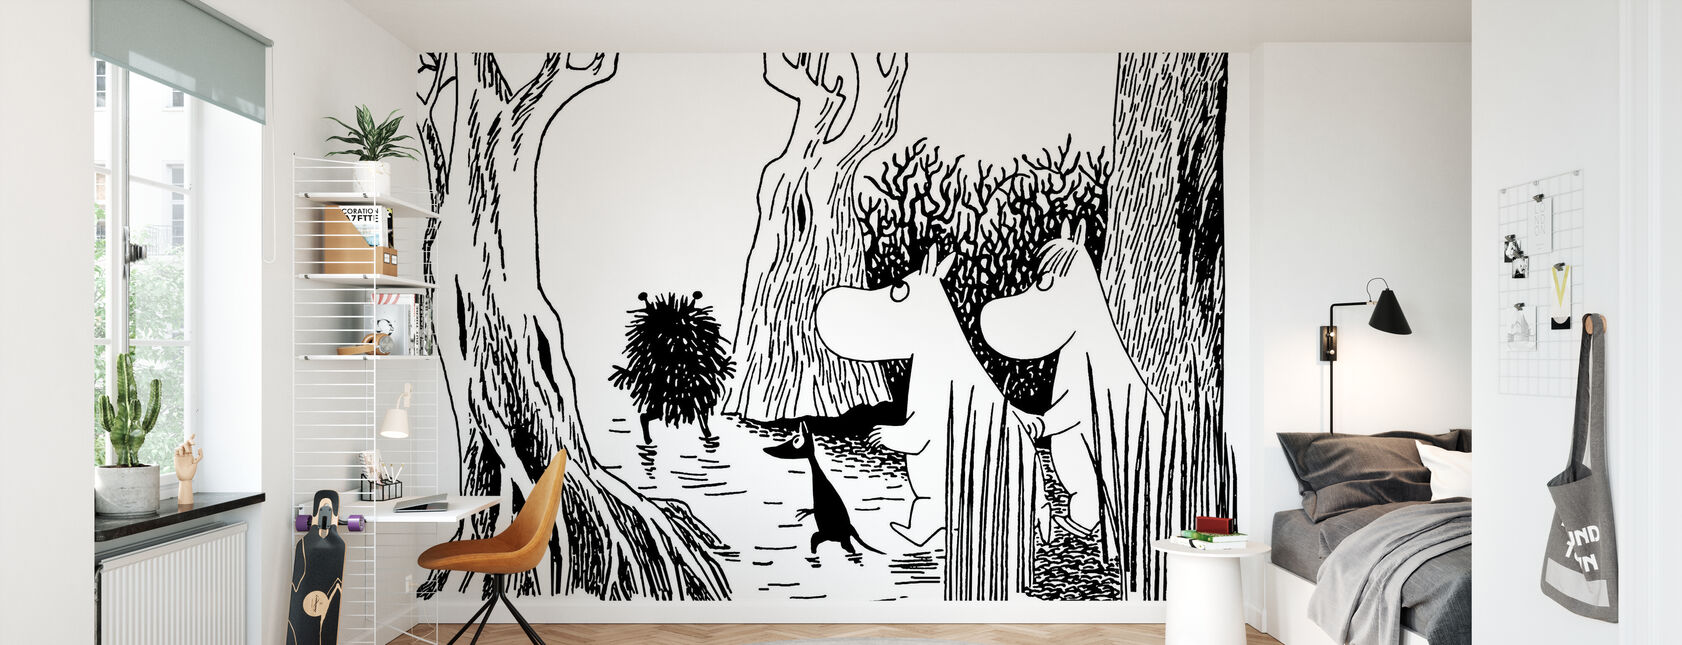 Moomin - Stinky - Behang - Kinderkamer